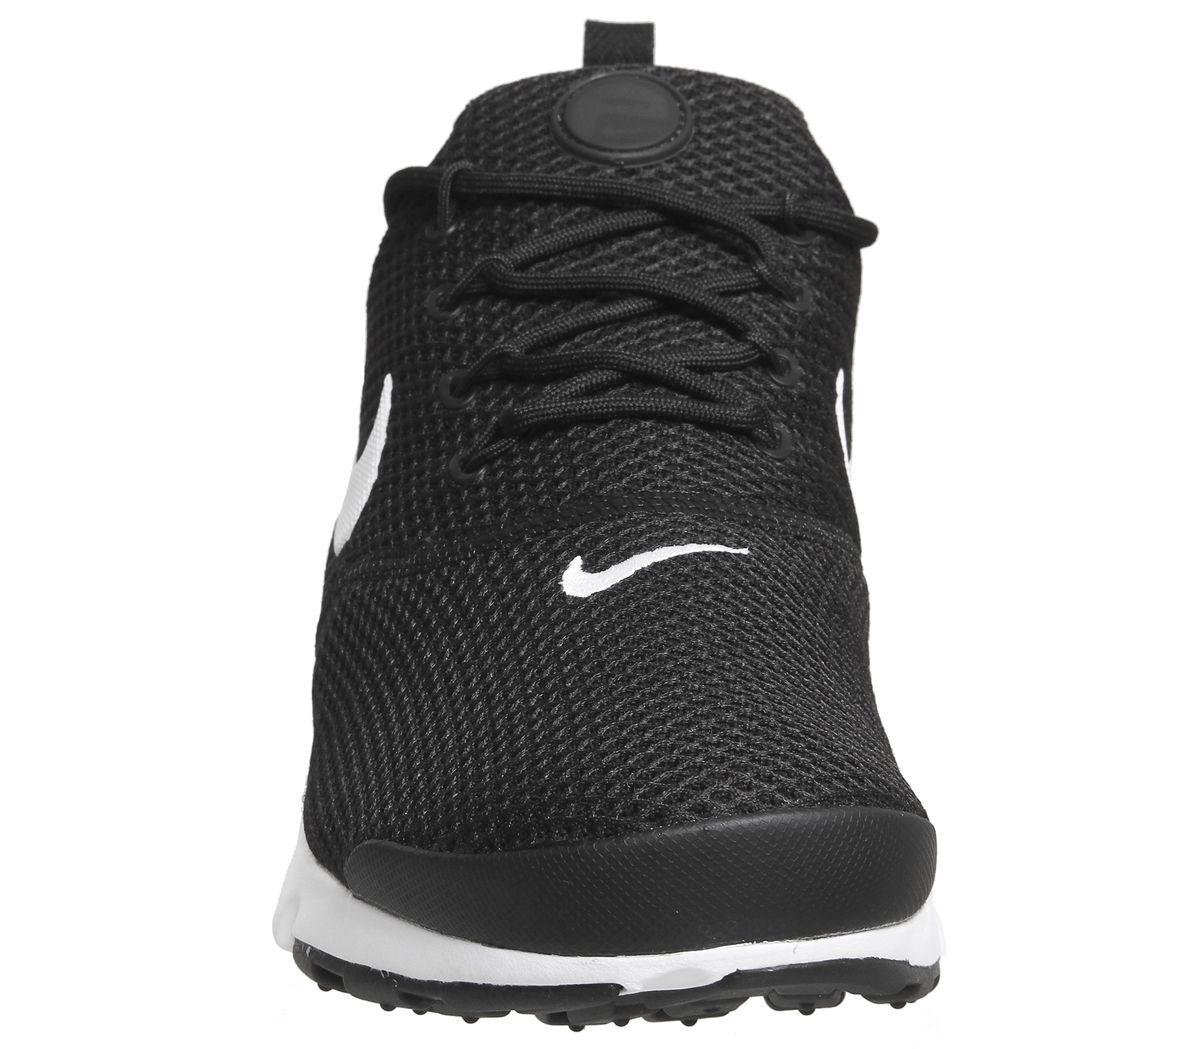 fa20529626e3 Nike Presto Fly Trainers Black White Black - Hers trainers